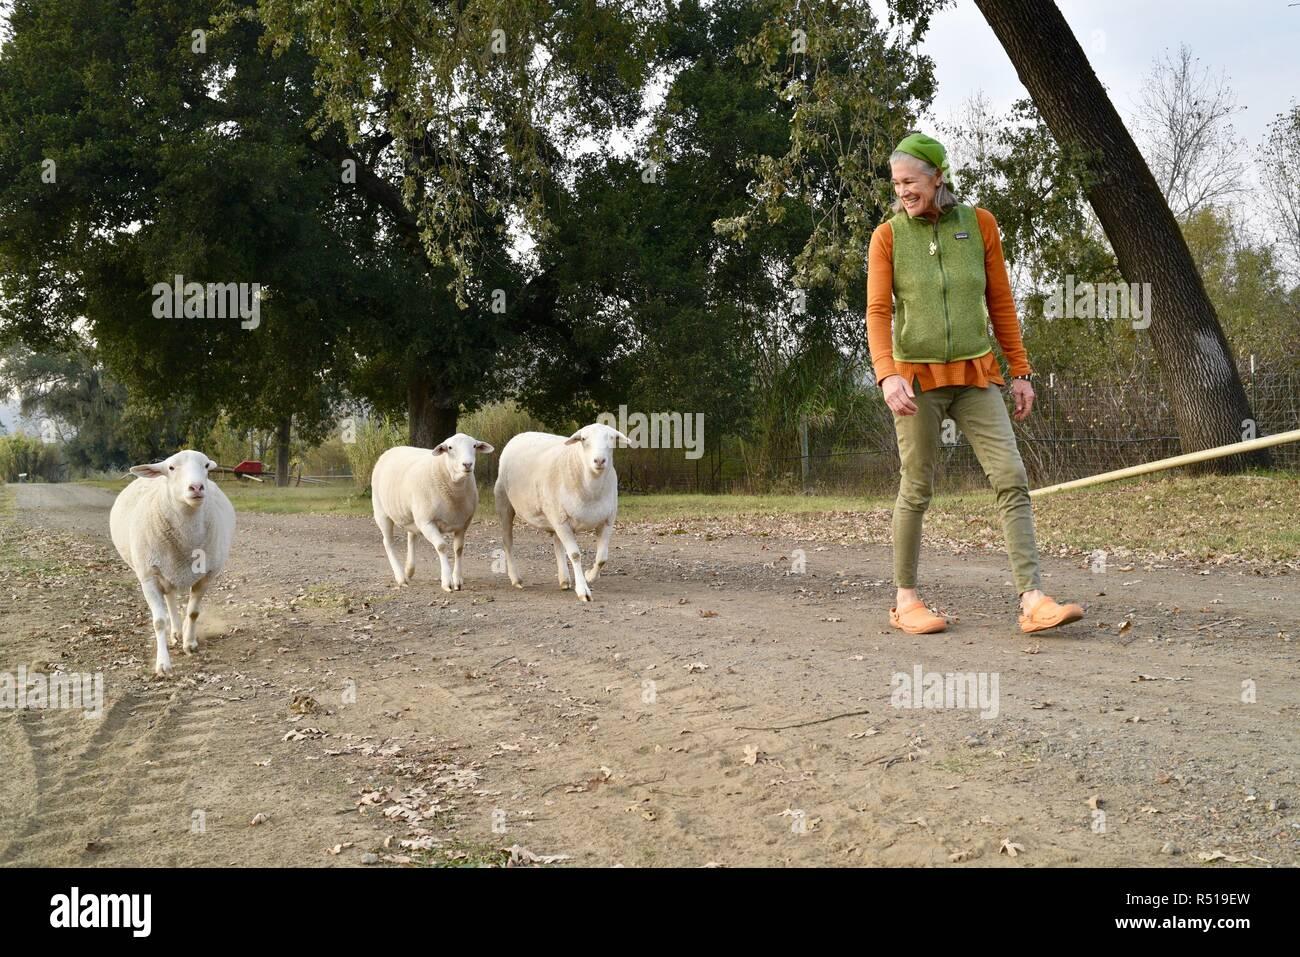 Female farmer walking with three sheep, Mimi is co-owner of organic Front Porch Farm, Healdsburg, California, USA. Stock Photo